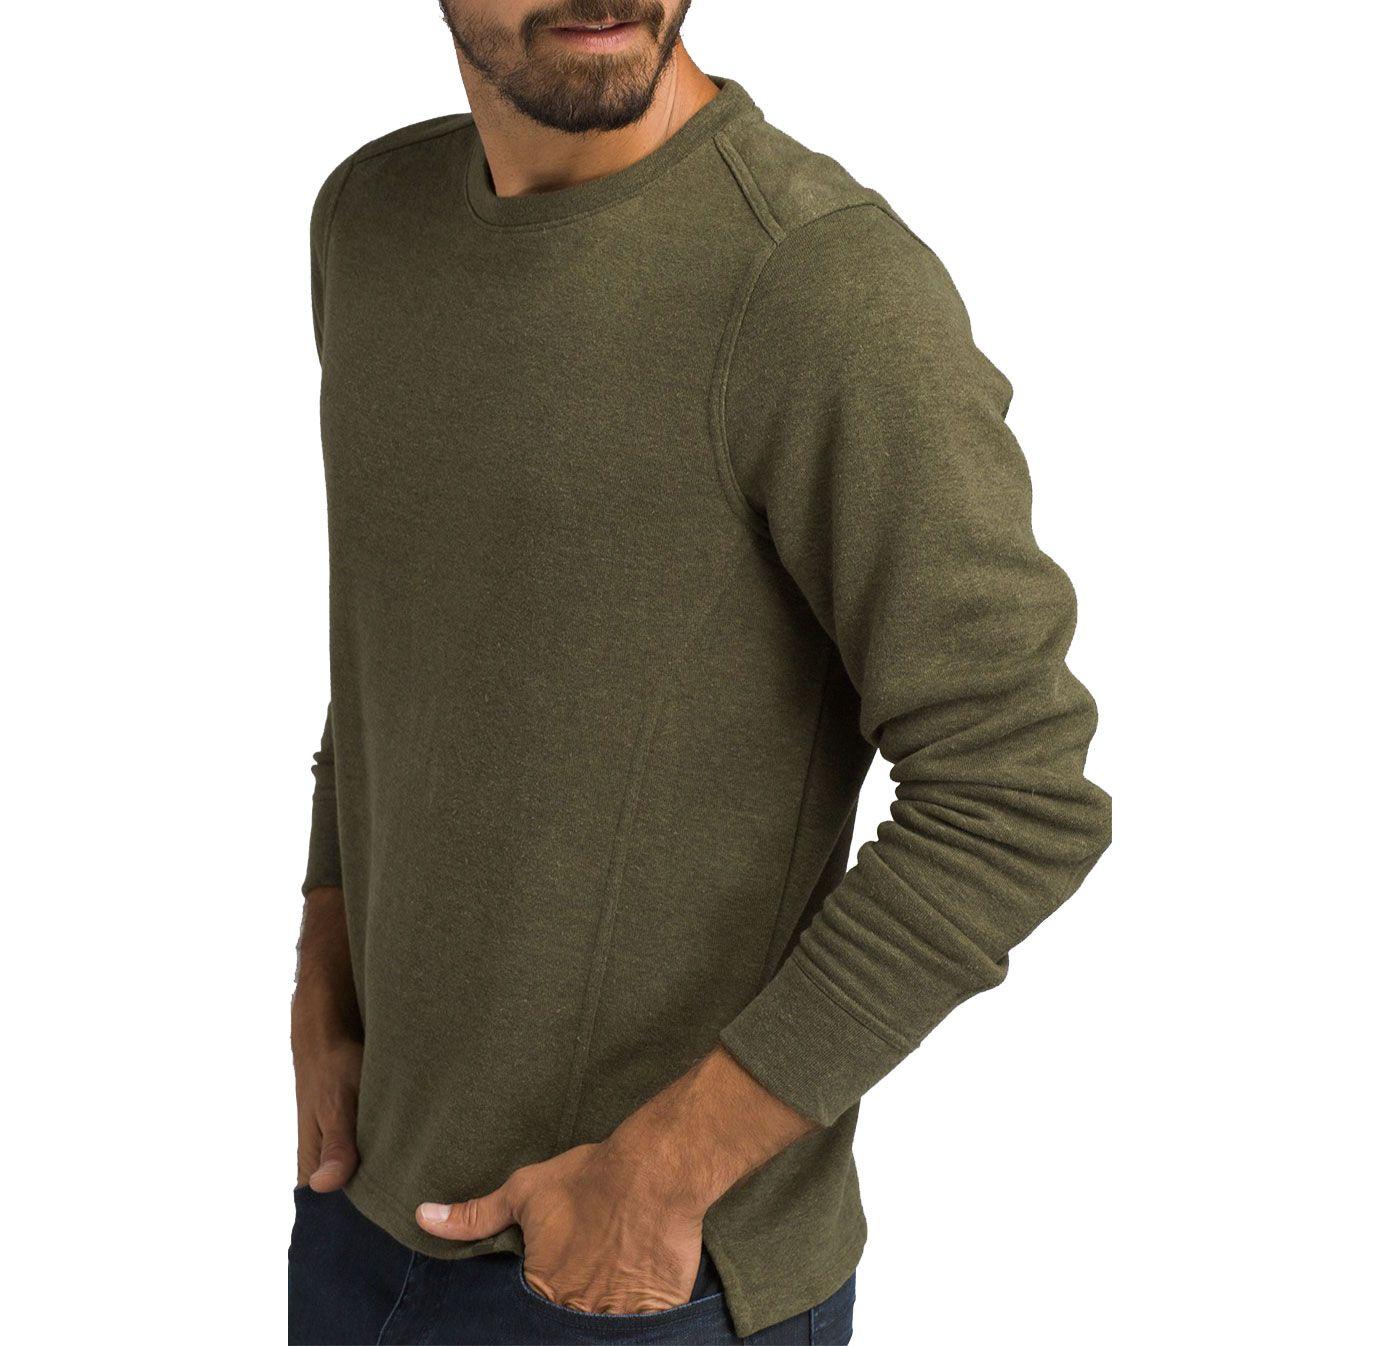 prAna Men's Norcross Crew Long Sleeve Shirt